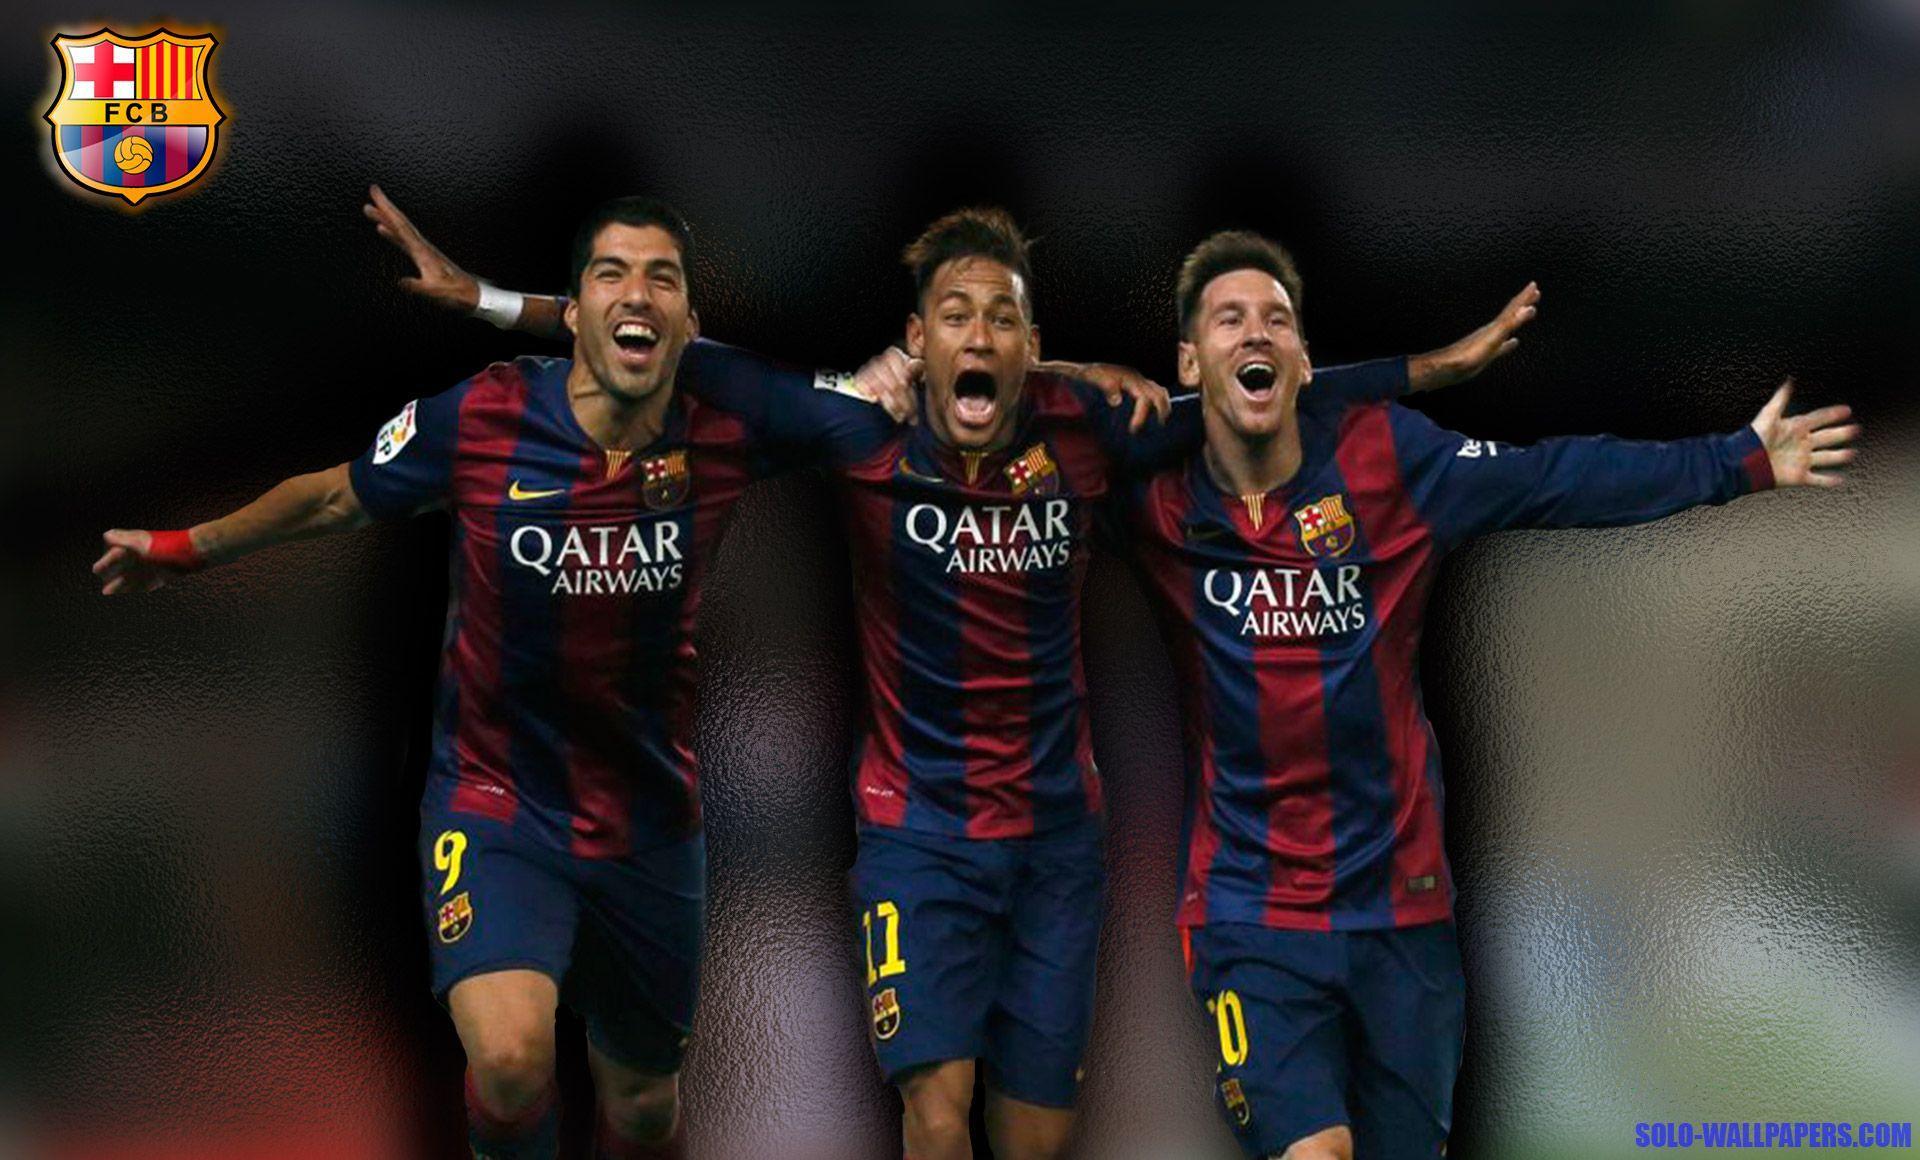 Messi Suarez Neymar Wallpapers Wallpaper Cave